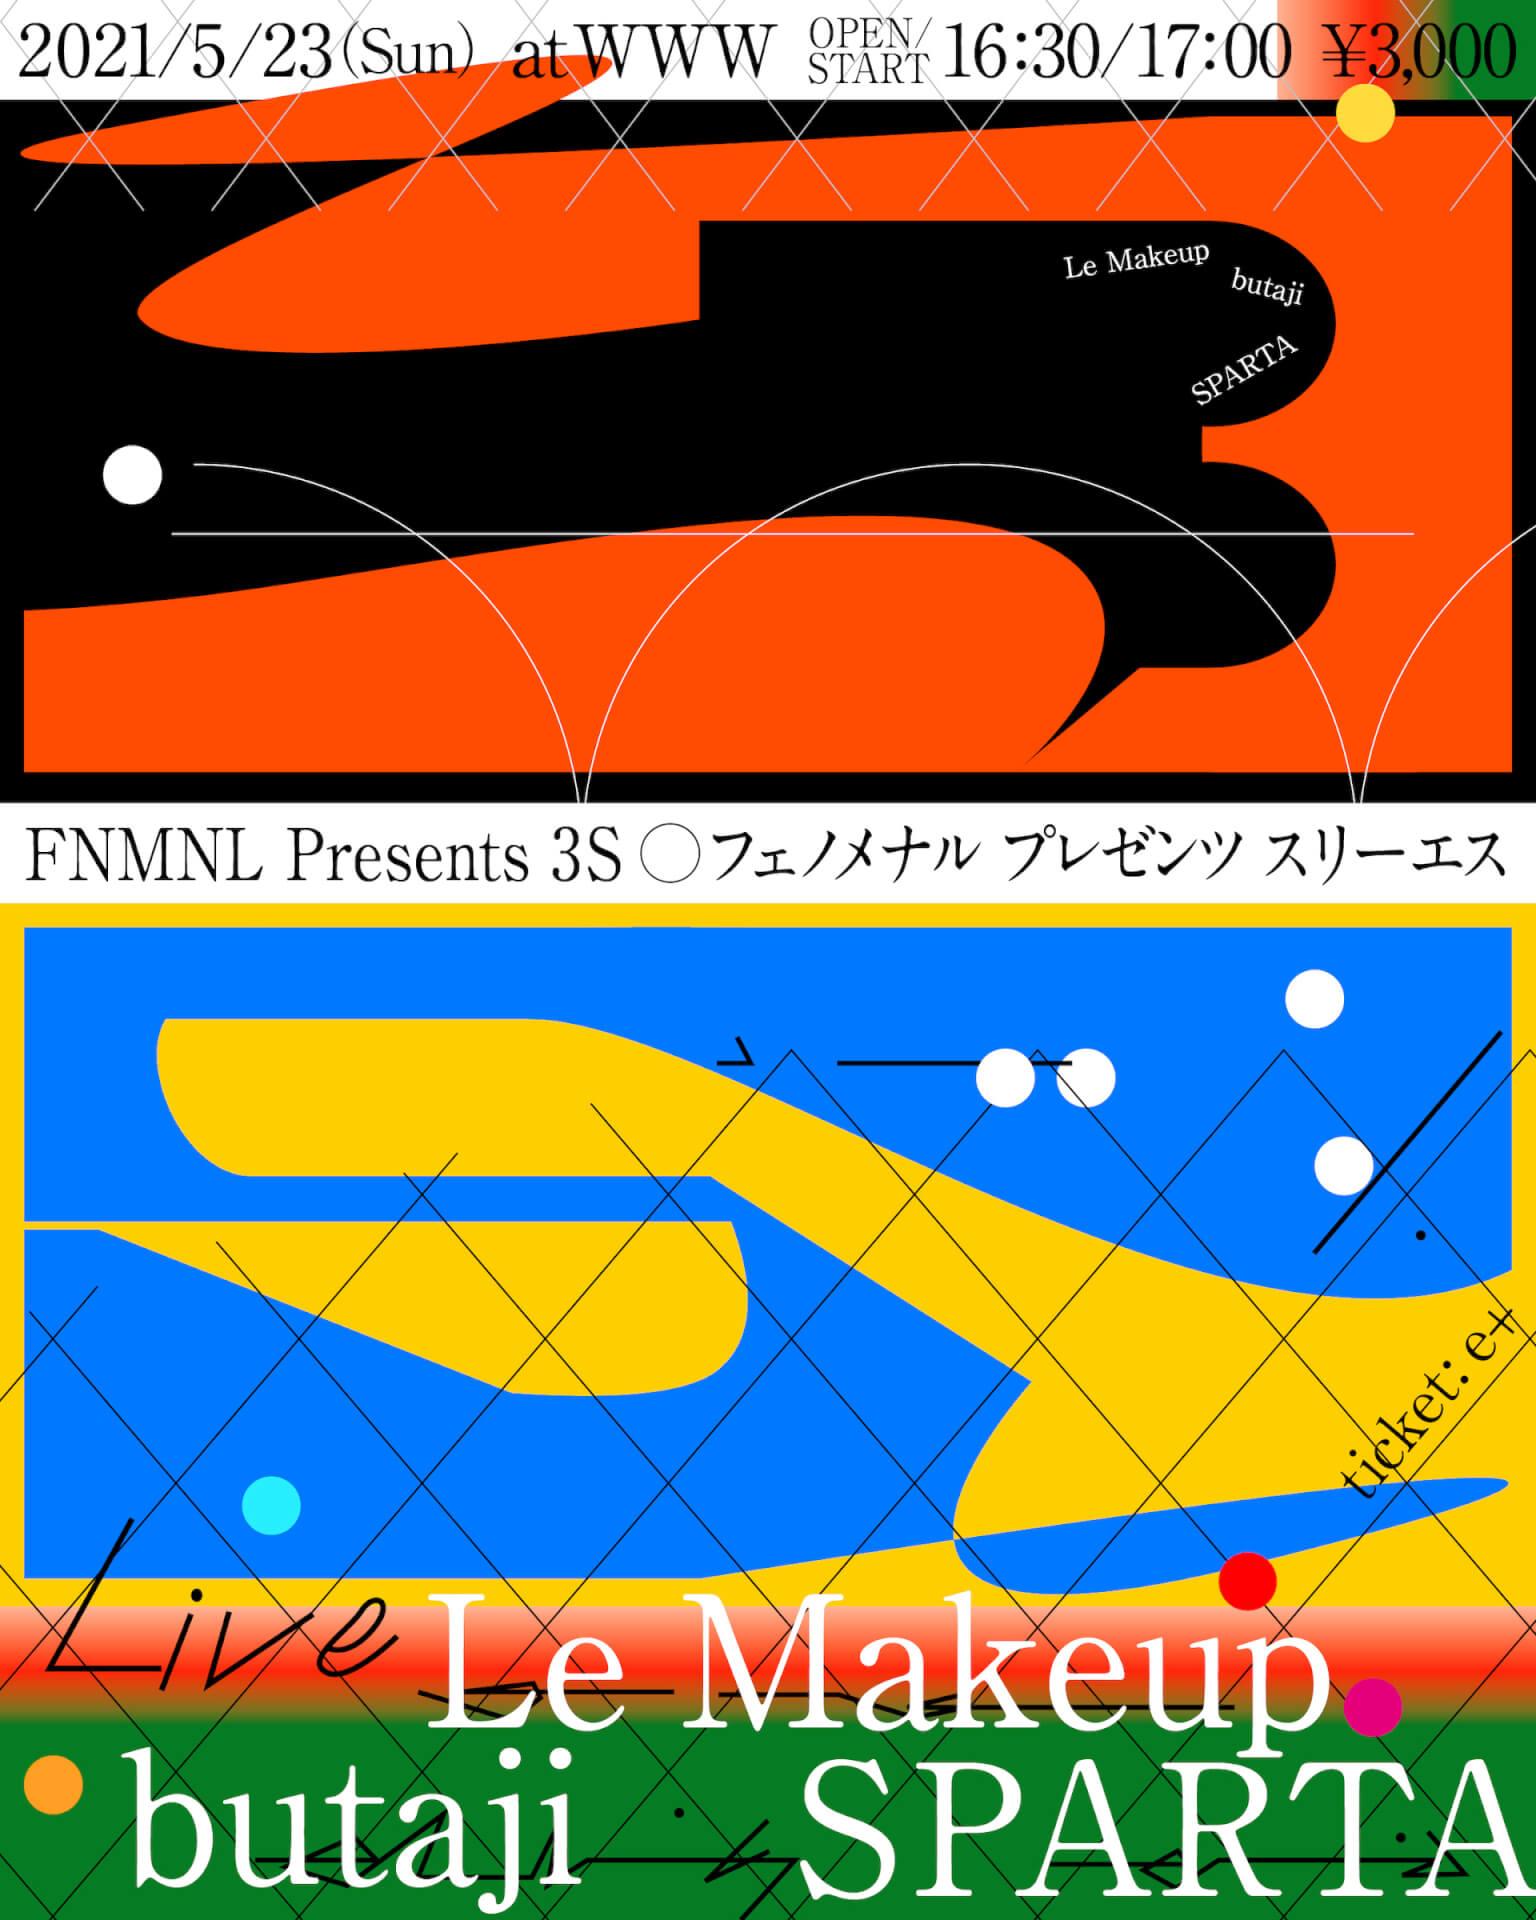 FNMNLキュレーションのイベント<3S>がWWWで開催決定!butaji、Le Makeup、SPARTAが登場 music210419_fnmnl_3s_4